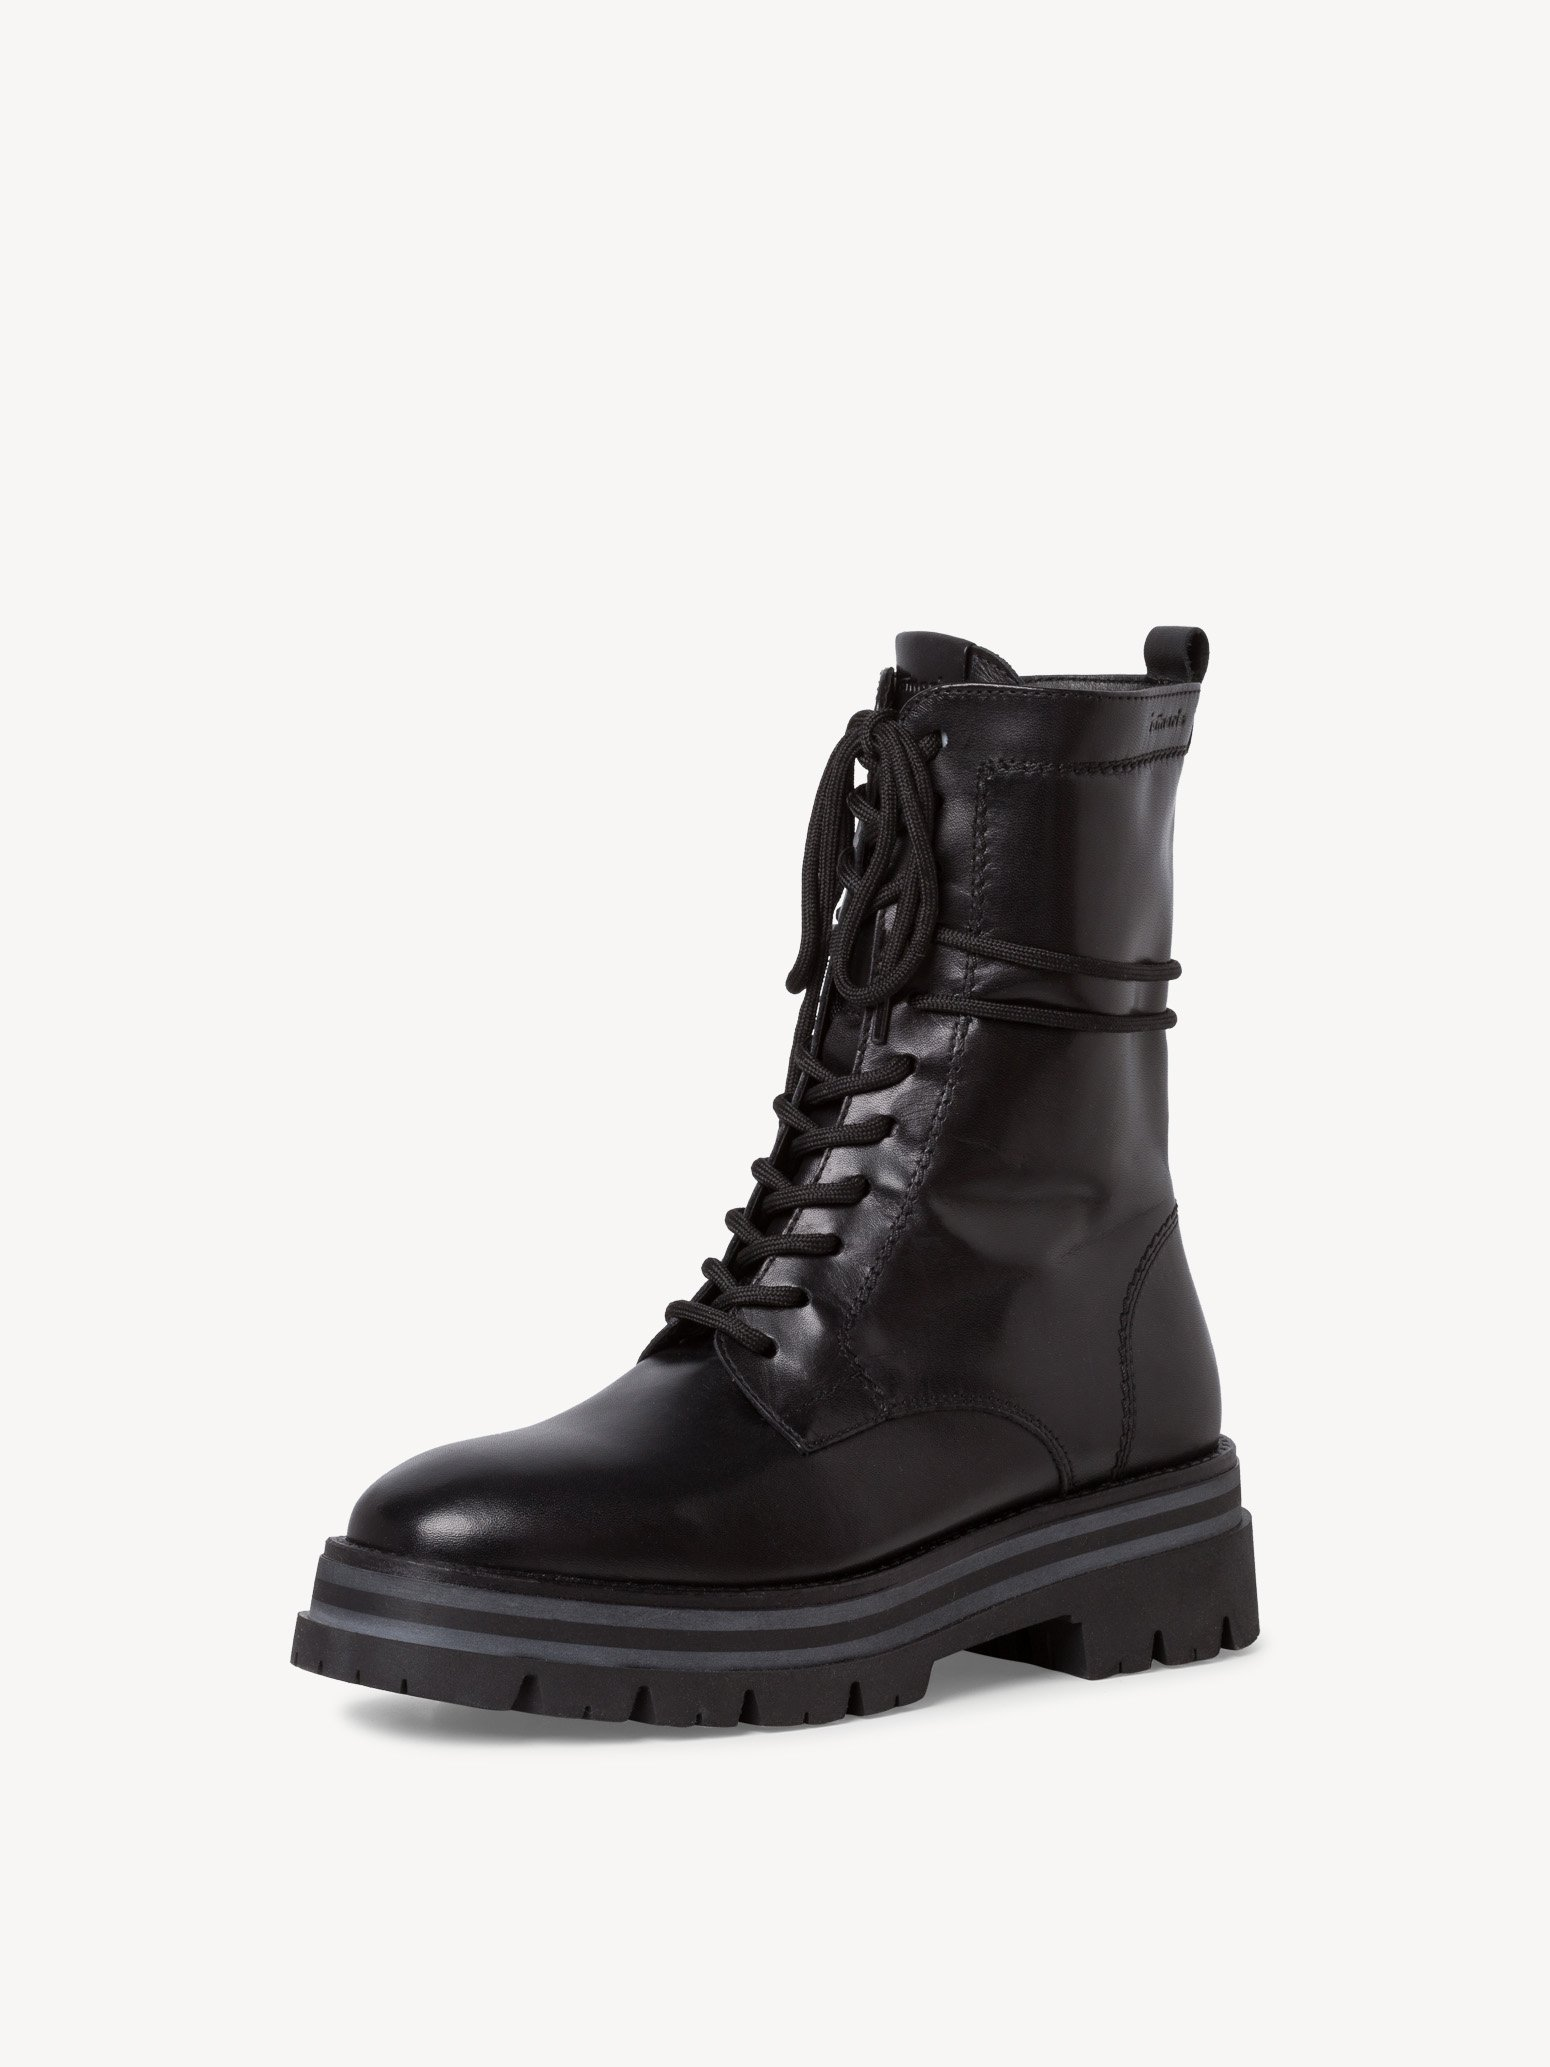 Ботинки Tamaris 1-1-25265-27-001